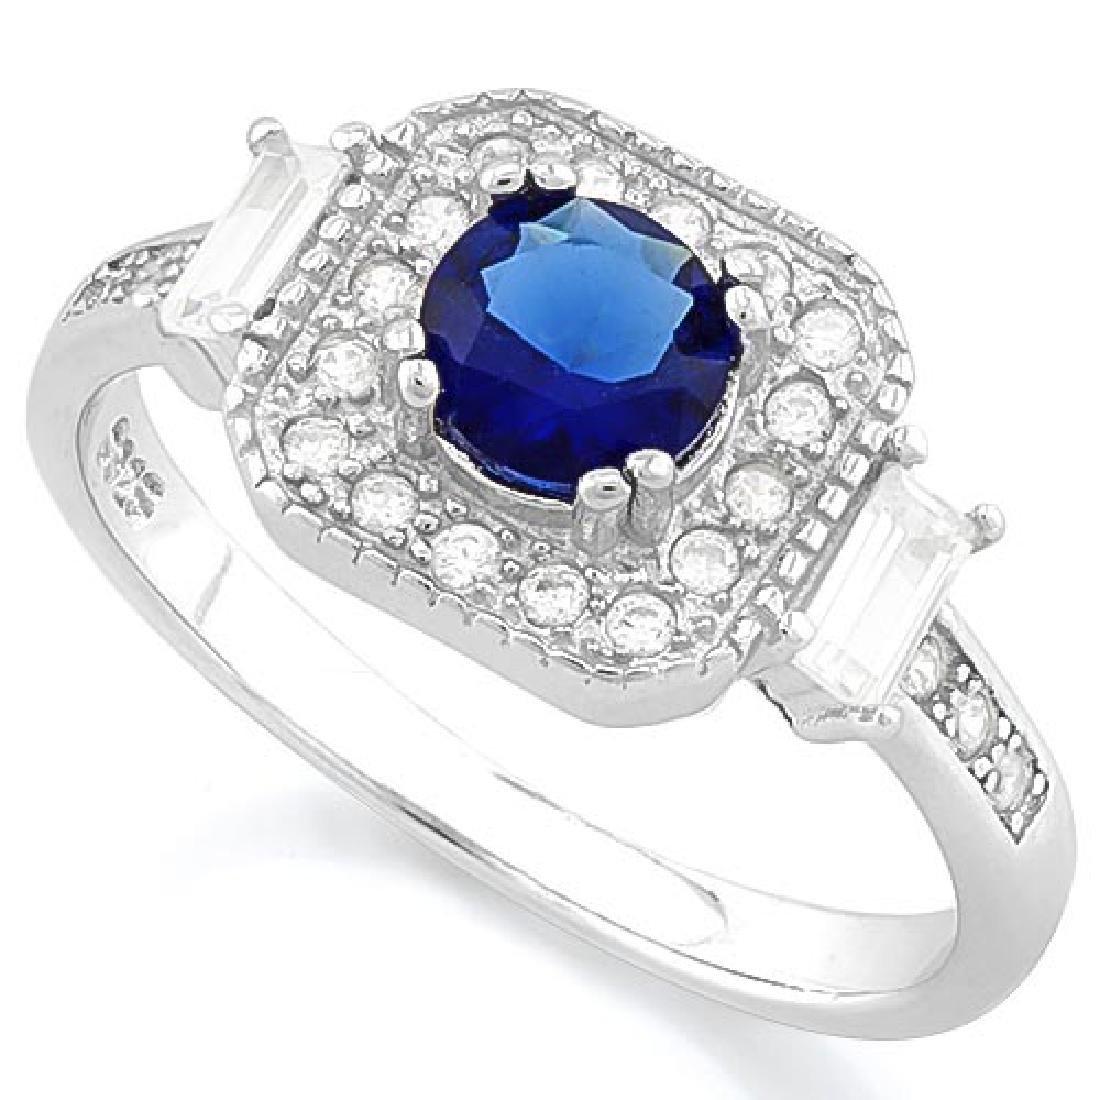 3/5 CTW CREATED BLUE SAPPHIRE & 1/4 CTW (24 PCS) FLAWLE